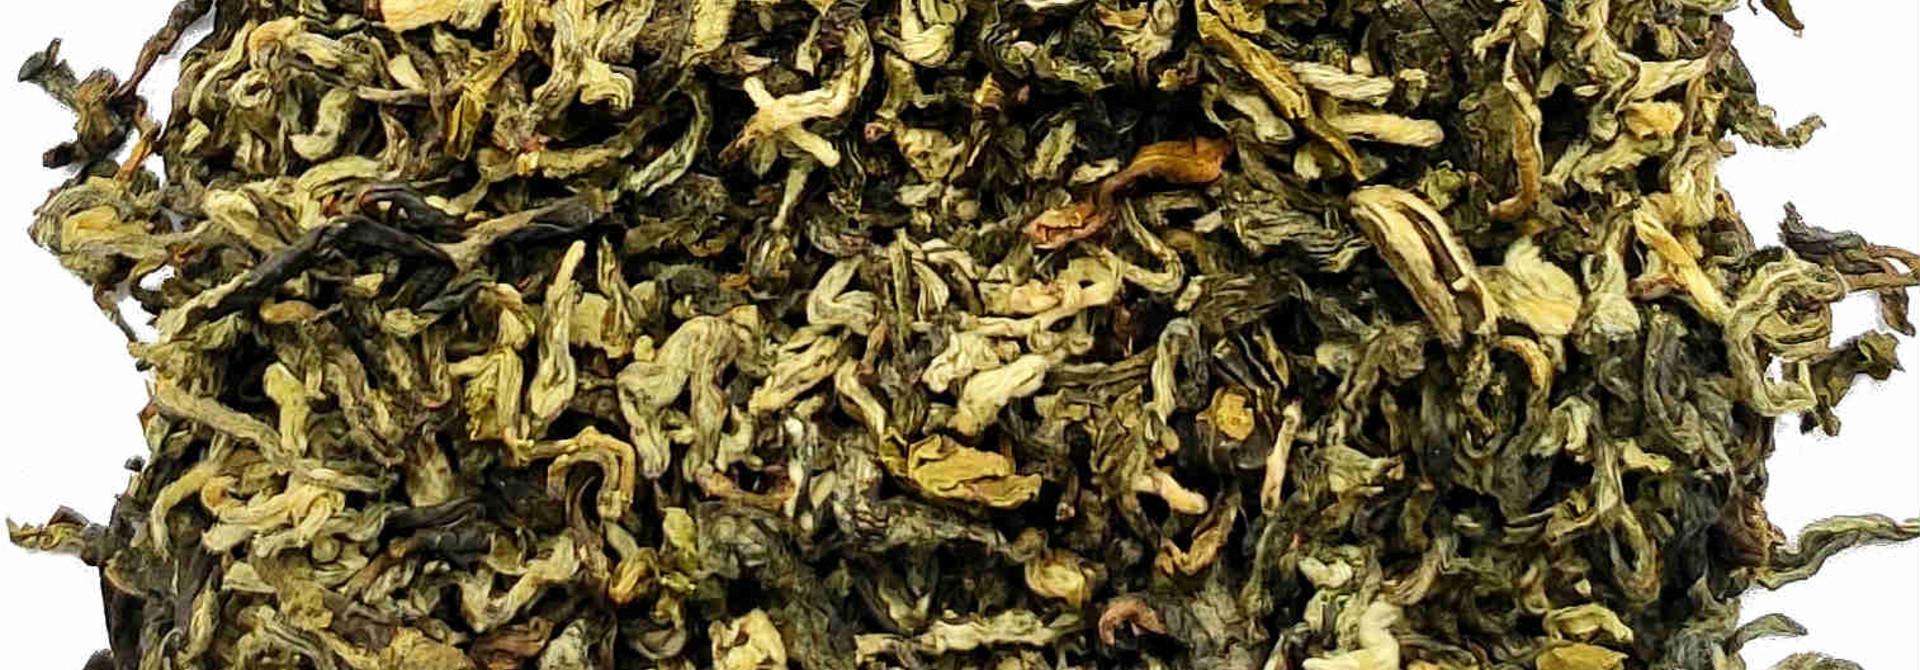 Grüner Tee Pi Lo Chun Top-Qualität